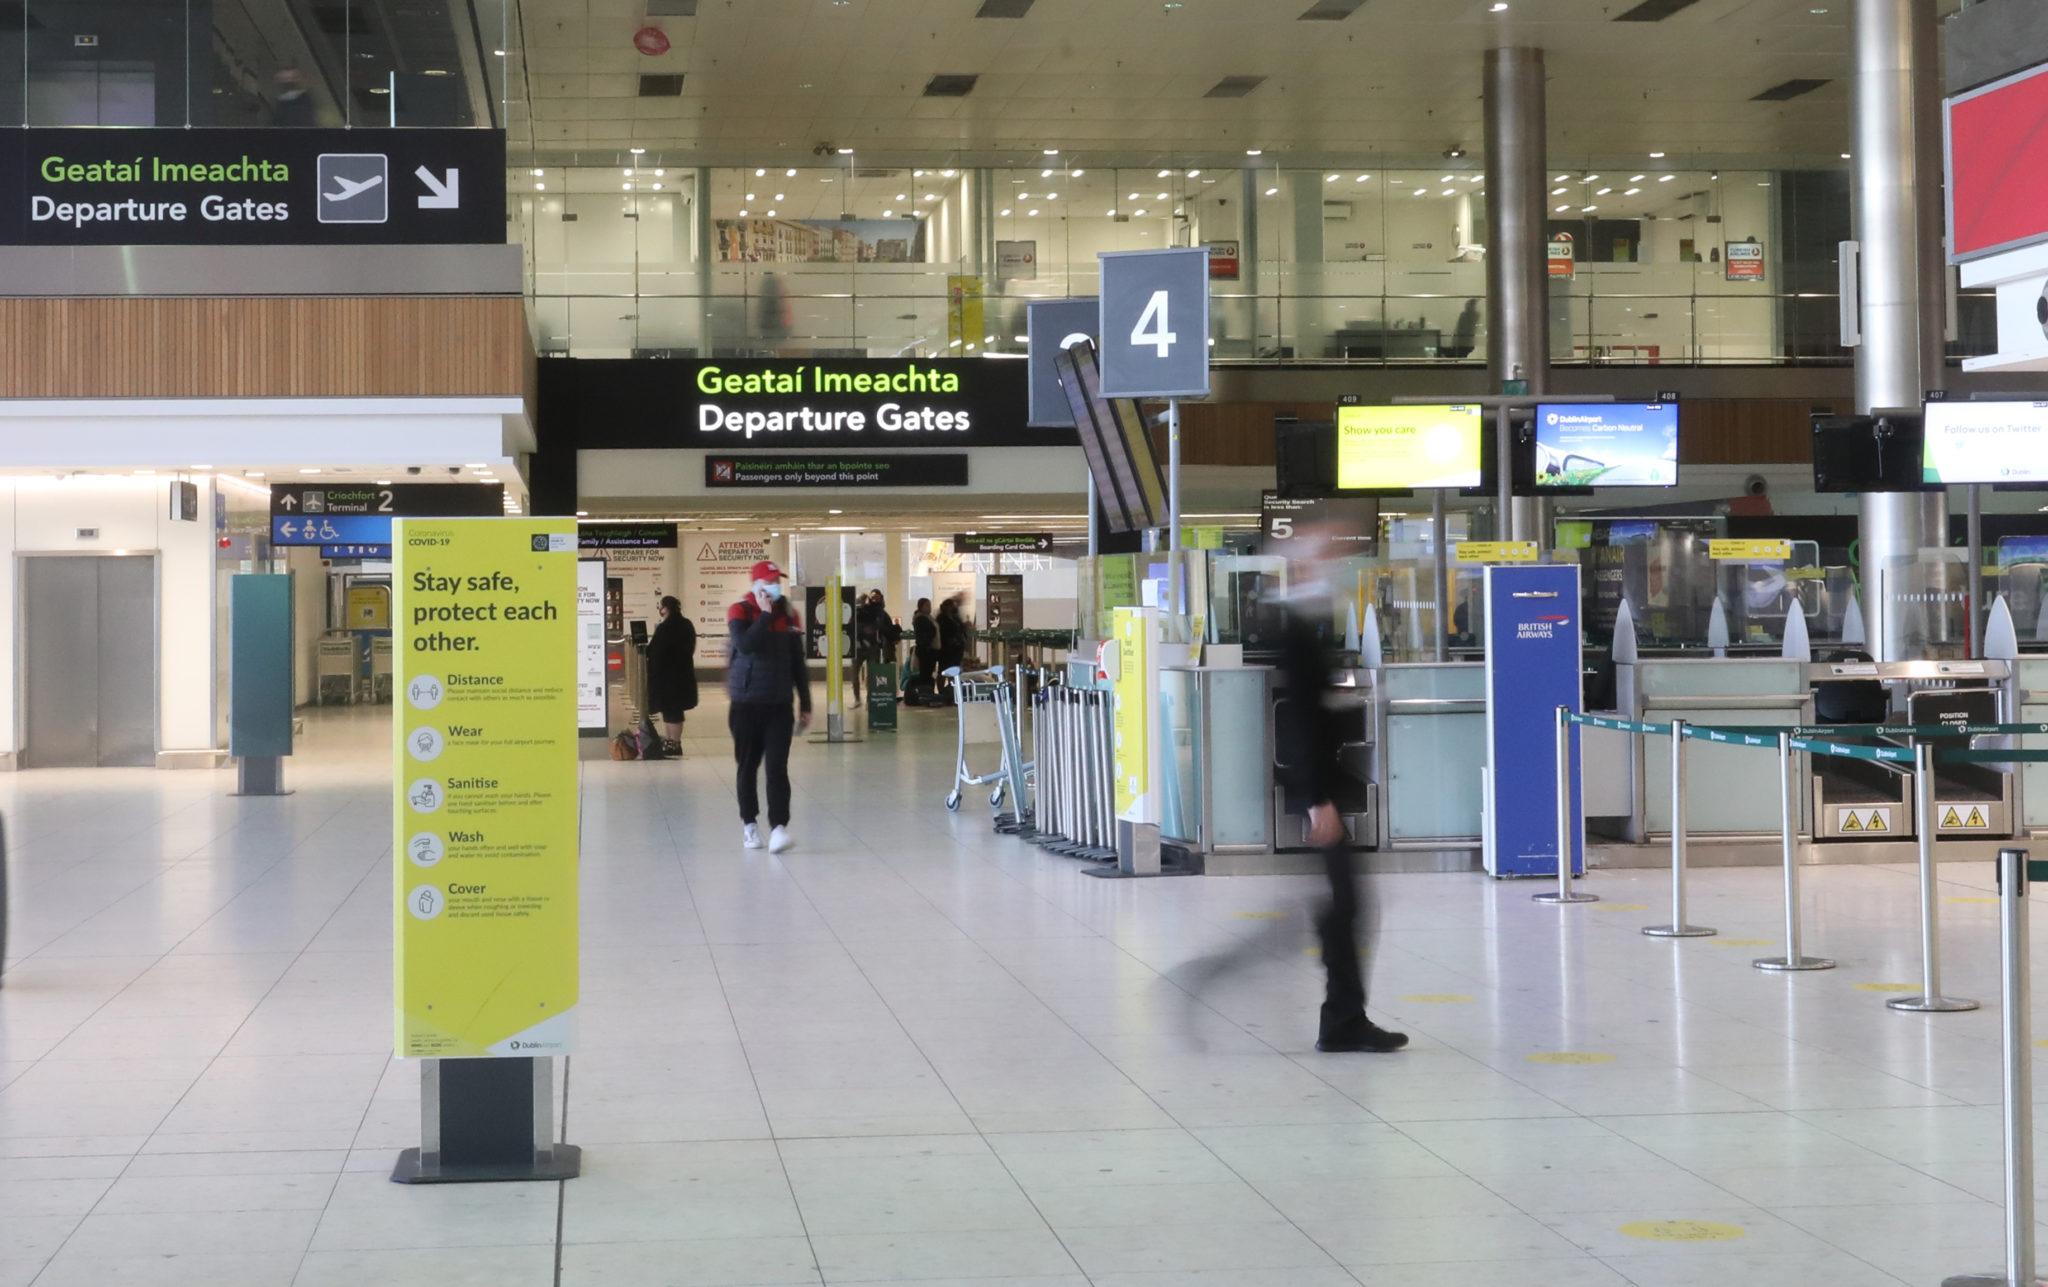 Passengers at Dublin Airport